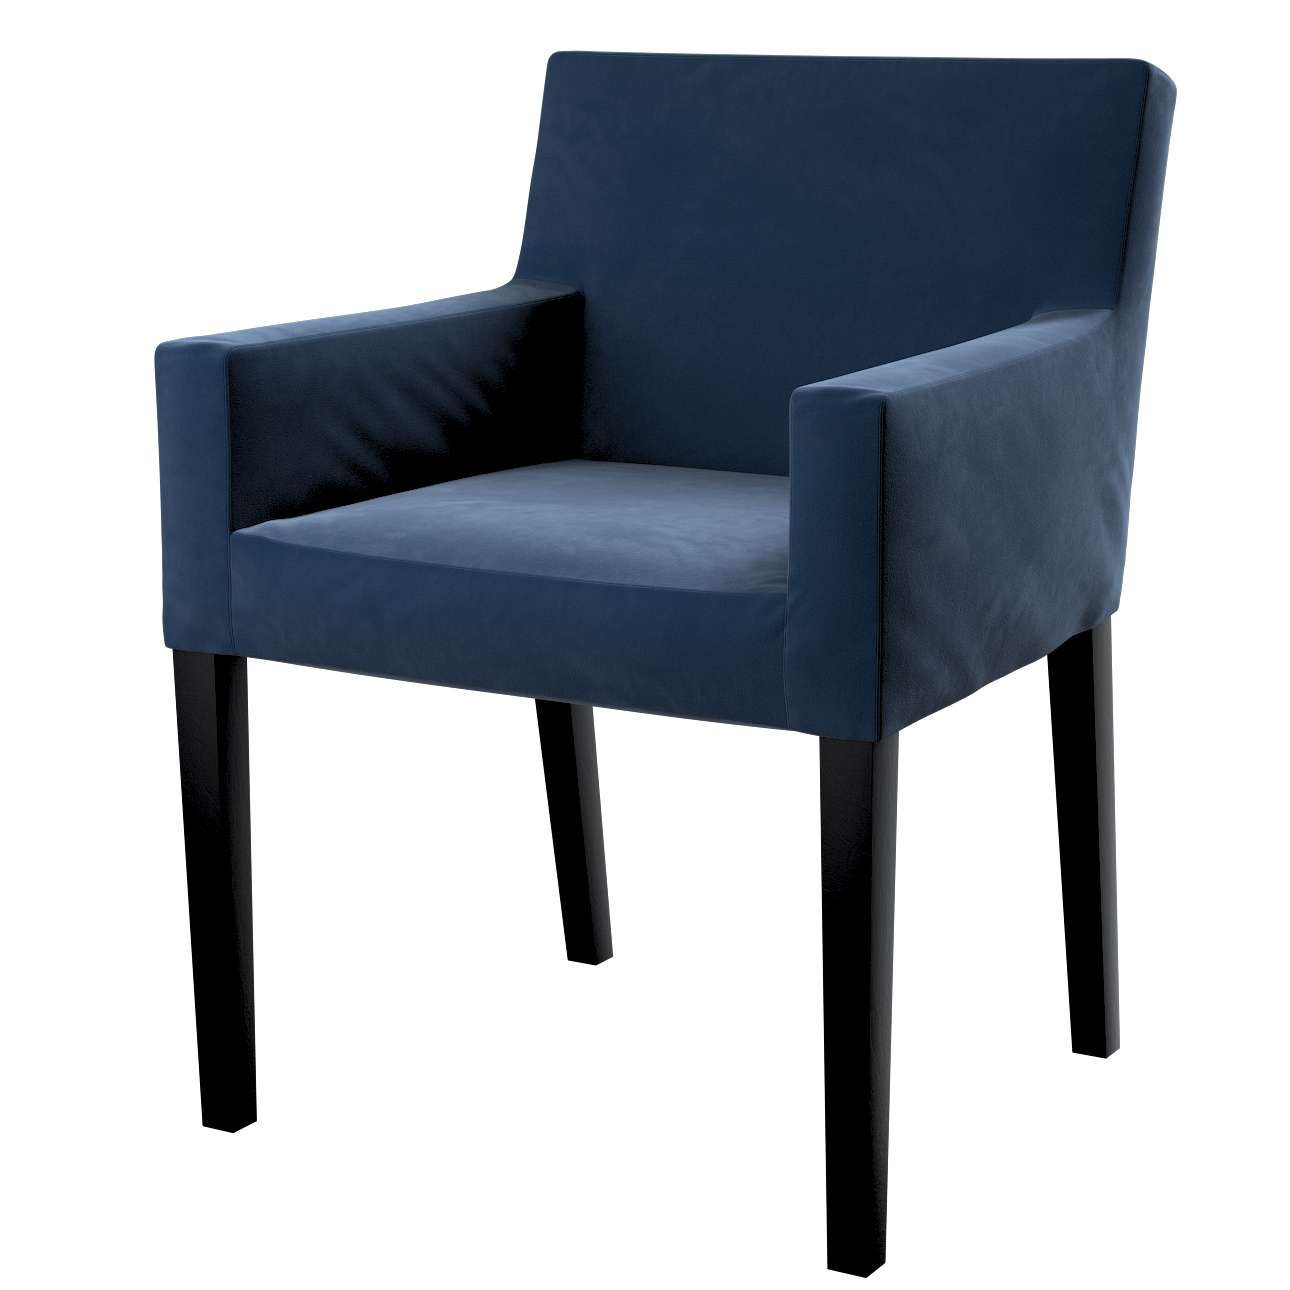 Návlek na stoličku s opierkami Nils V kolekcii Velvet, tkanina: 704-29